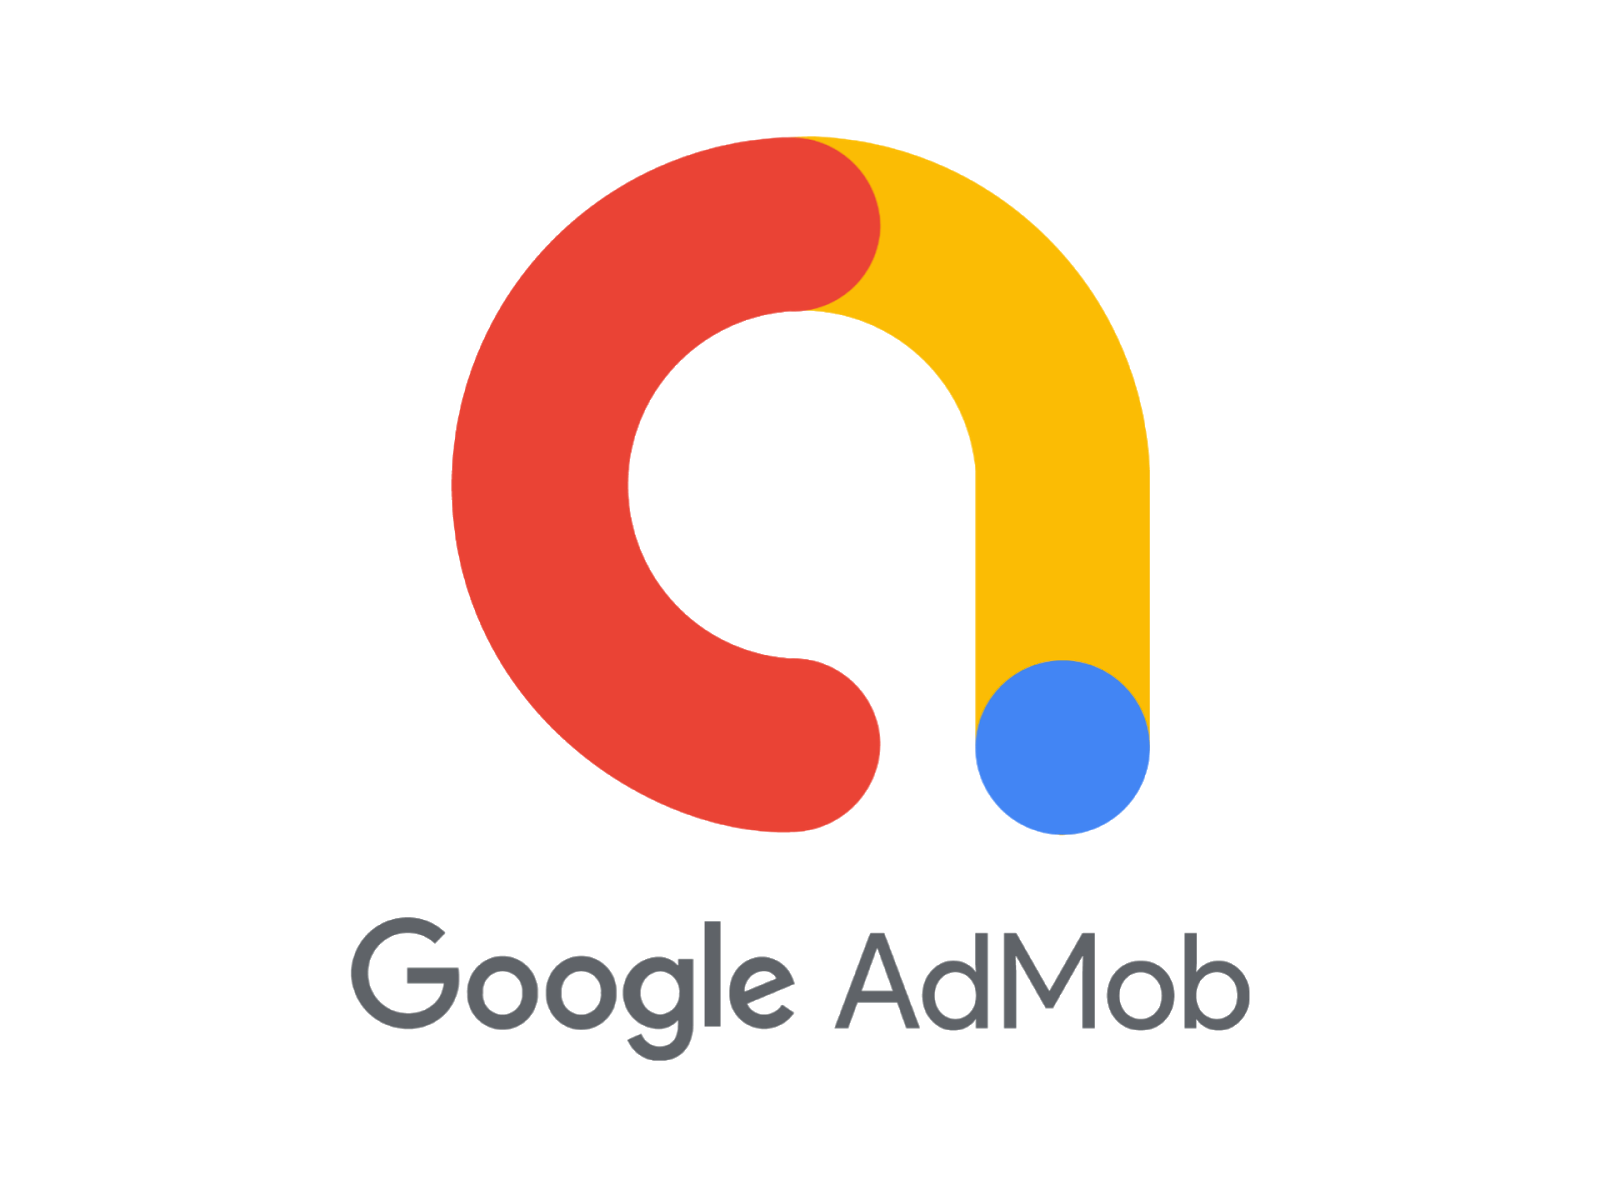 Logo Google AdMob Format PNG